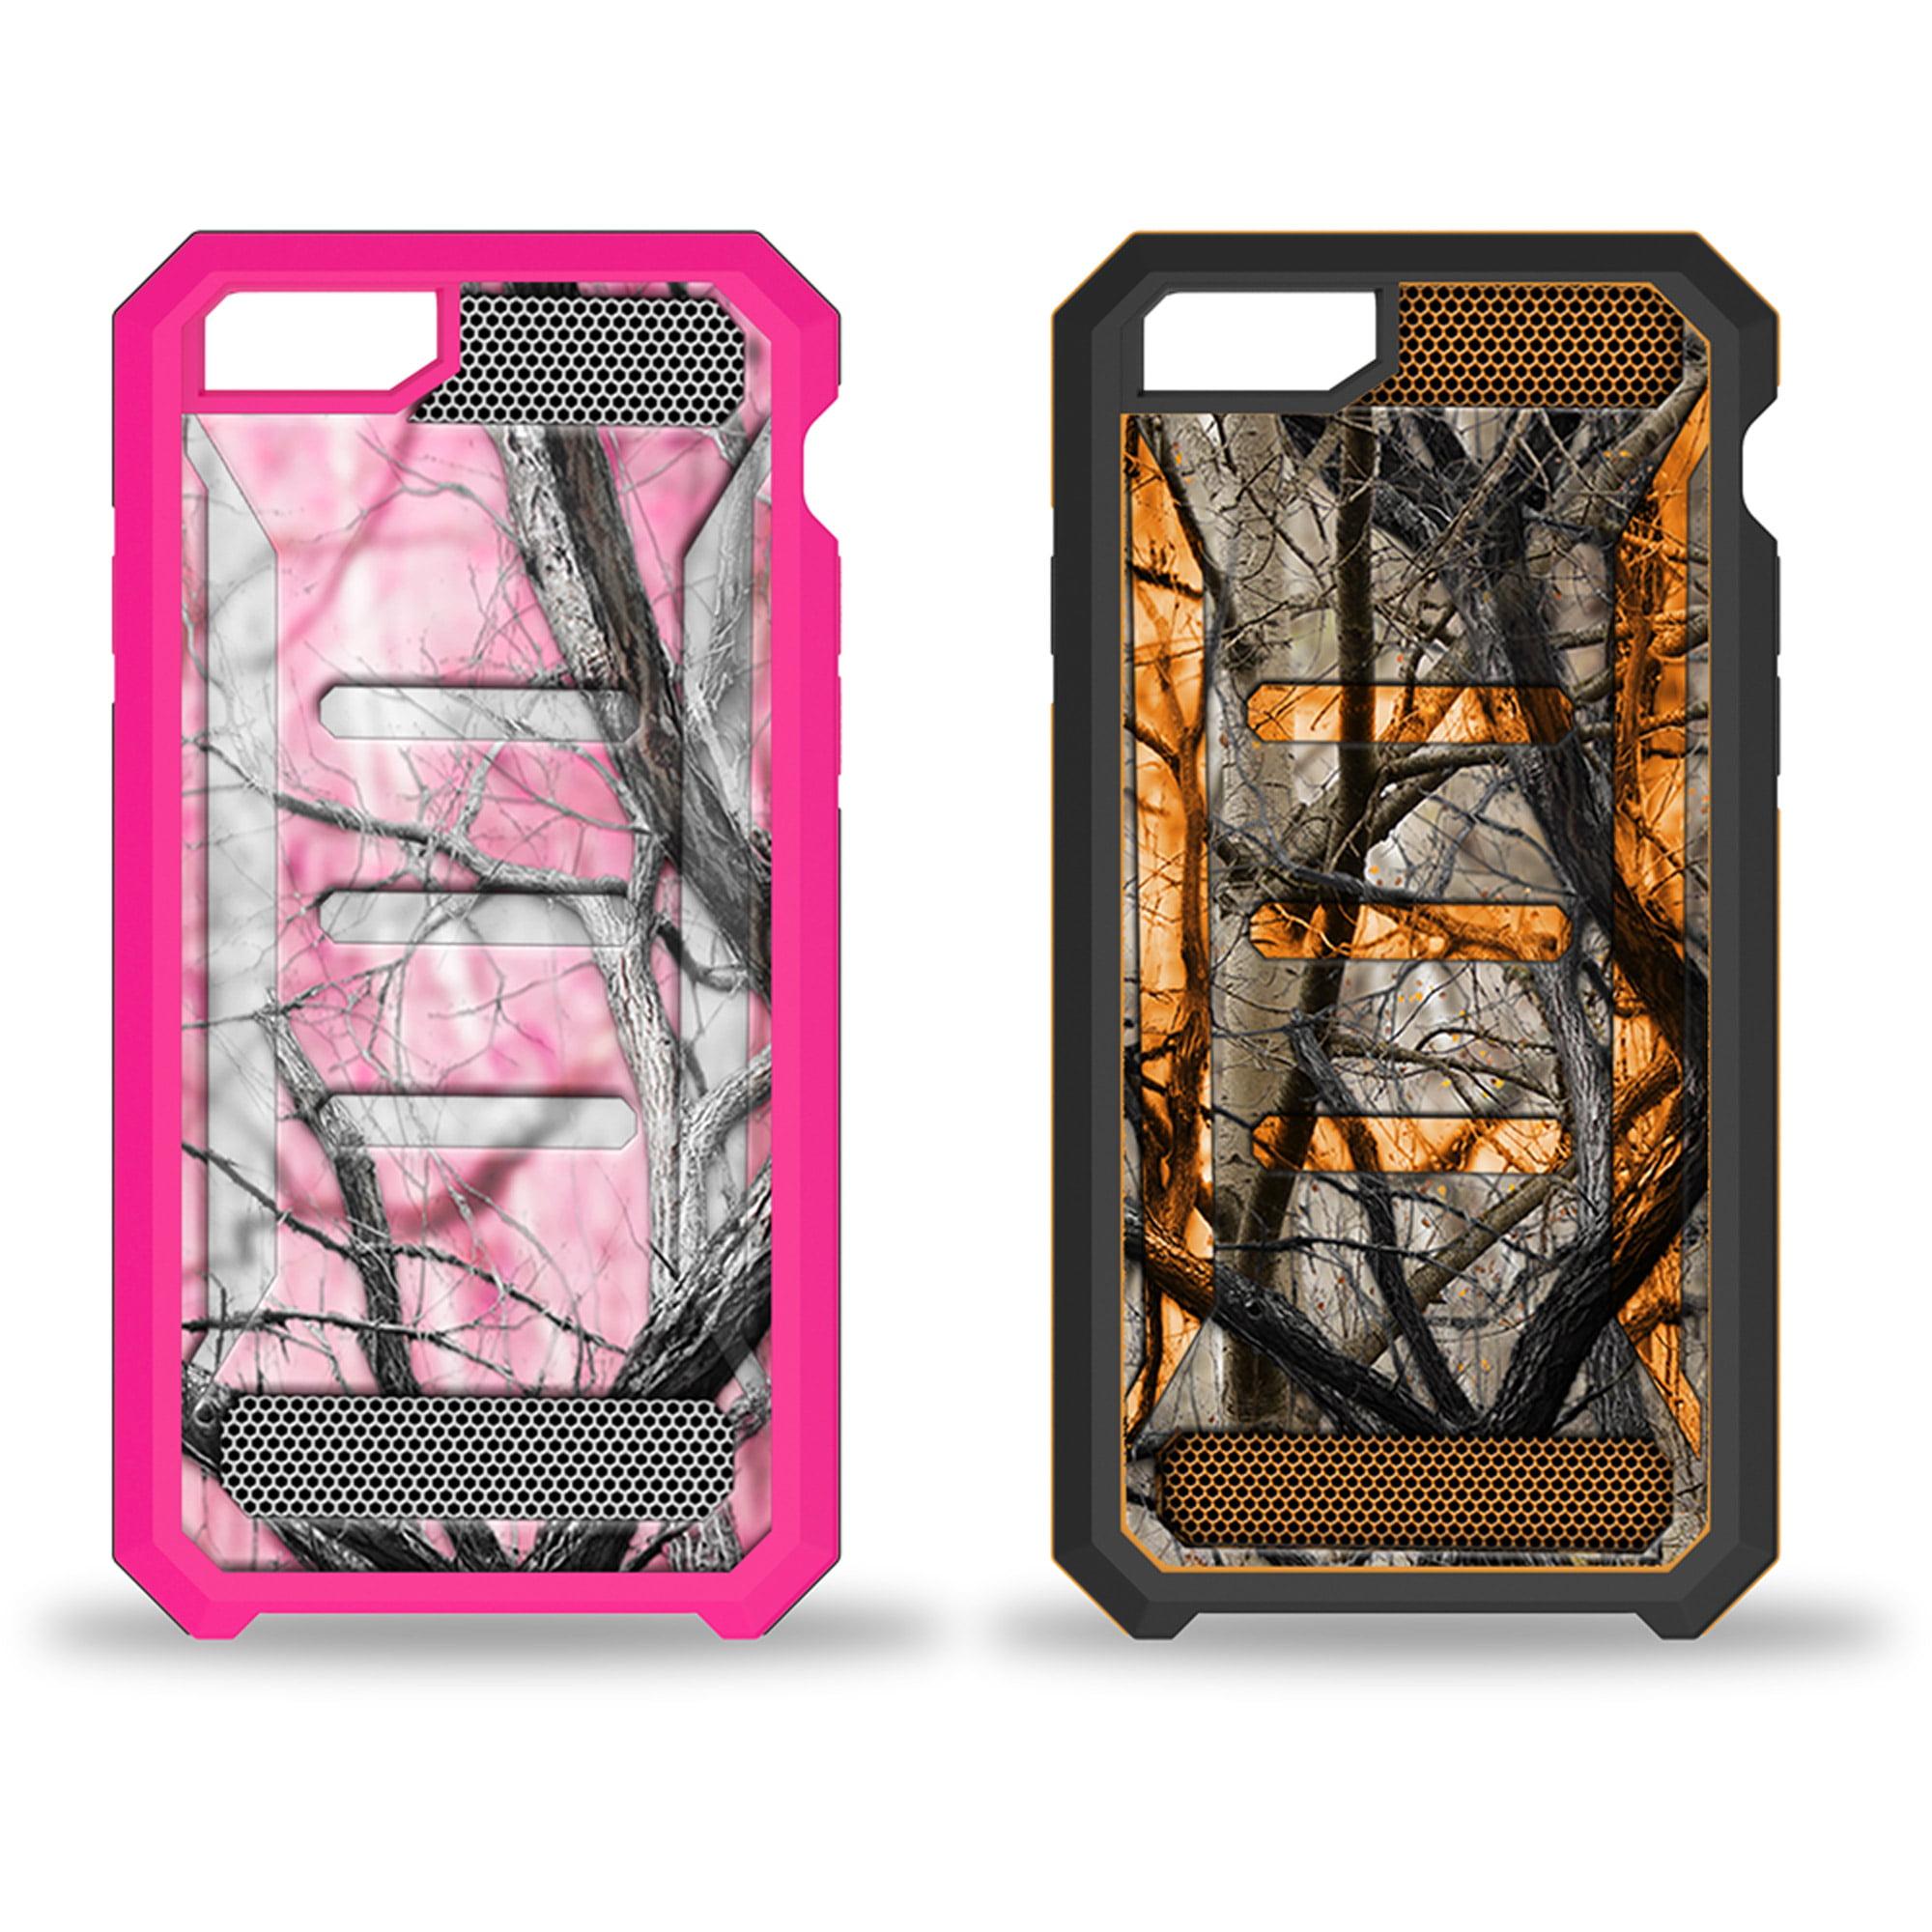 new concept 8d53a 1be68 Lacrosse Impact Gel Ip6 Phn Case, Pink Camo